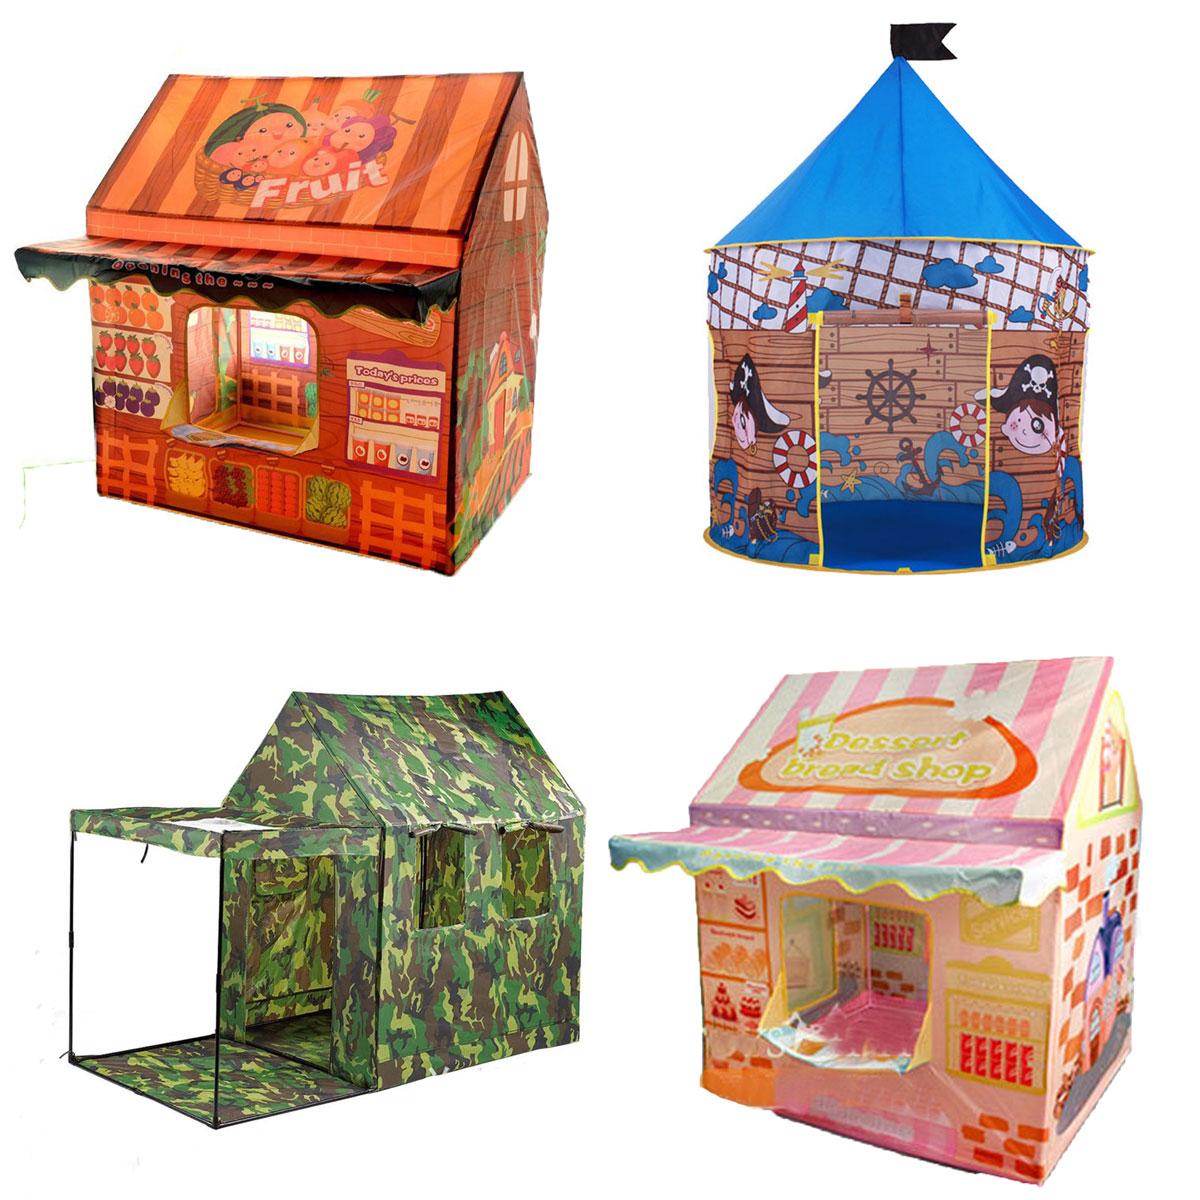 Princess Castle Play Tent For Girls Boys Toys Best Christmas Birthday Gift Foldable Play Playhouse Portable Yurt